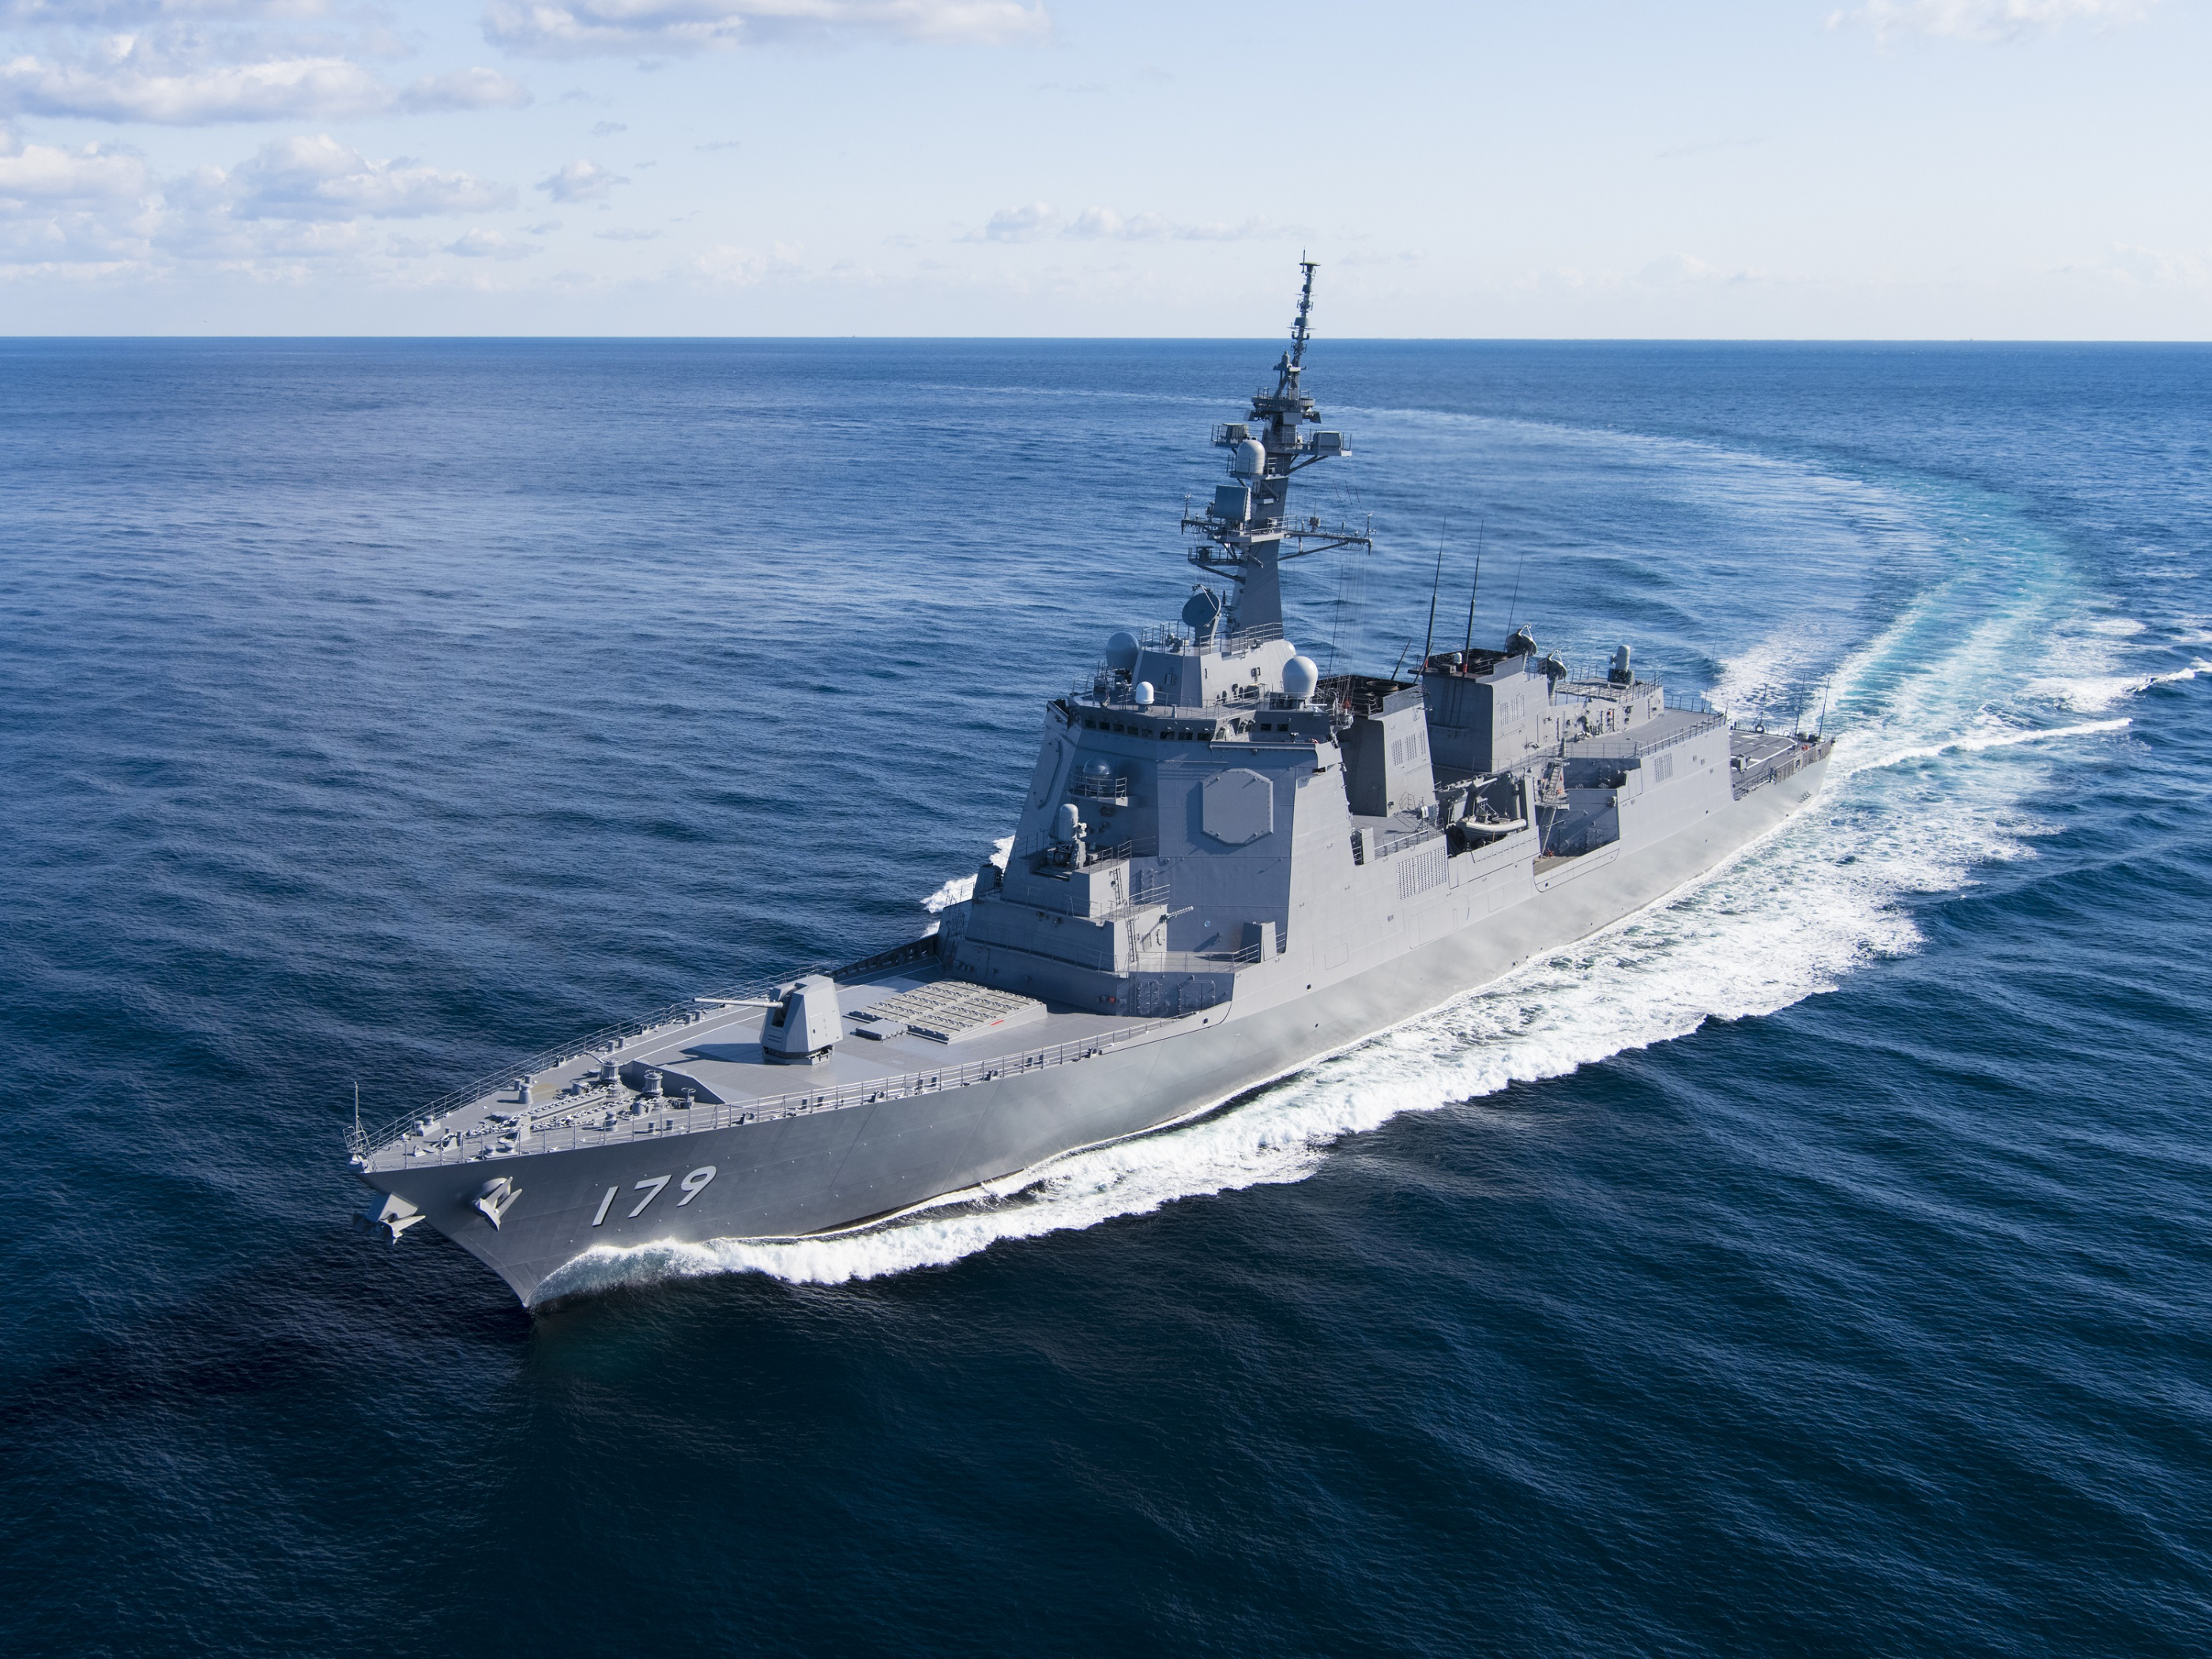 護衛艦「まや」型 水上艦艇 装備品 海上自衛隊 〔JMSDF ...